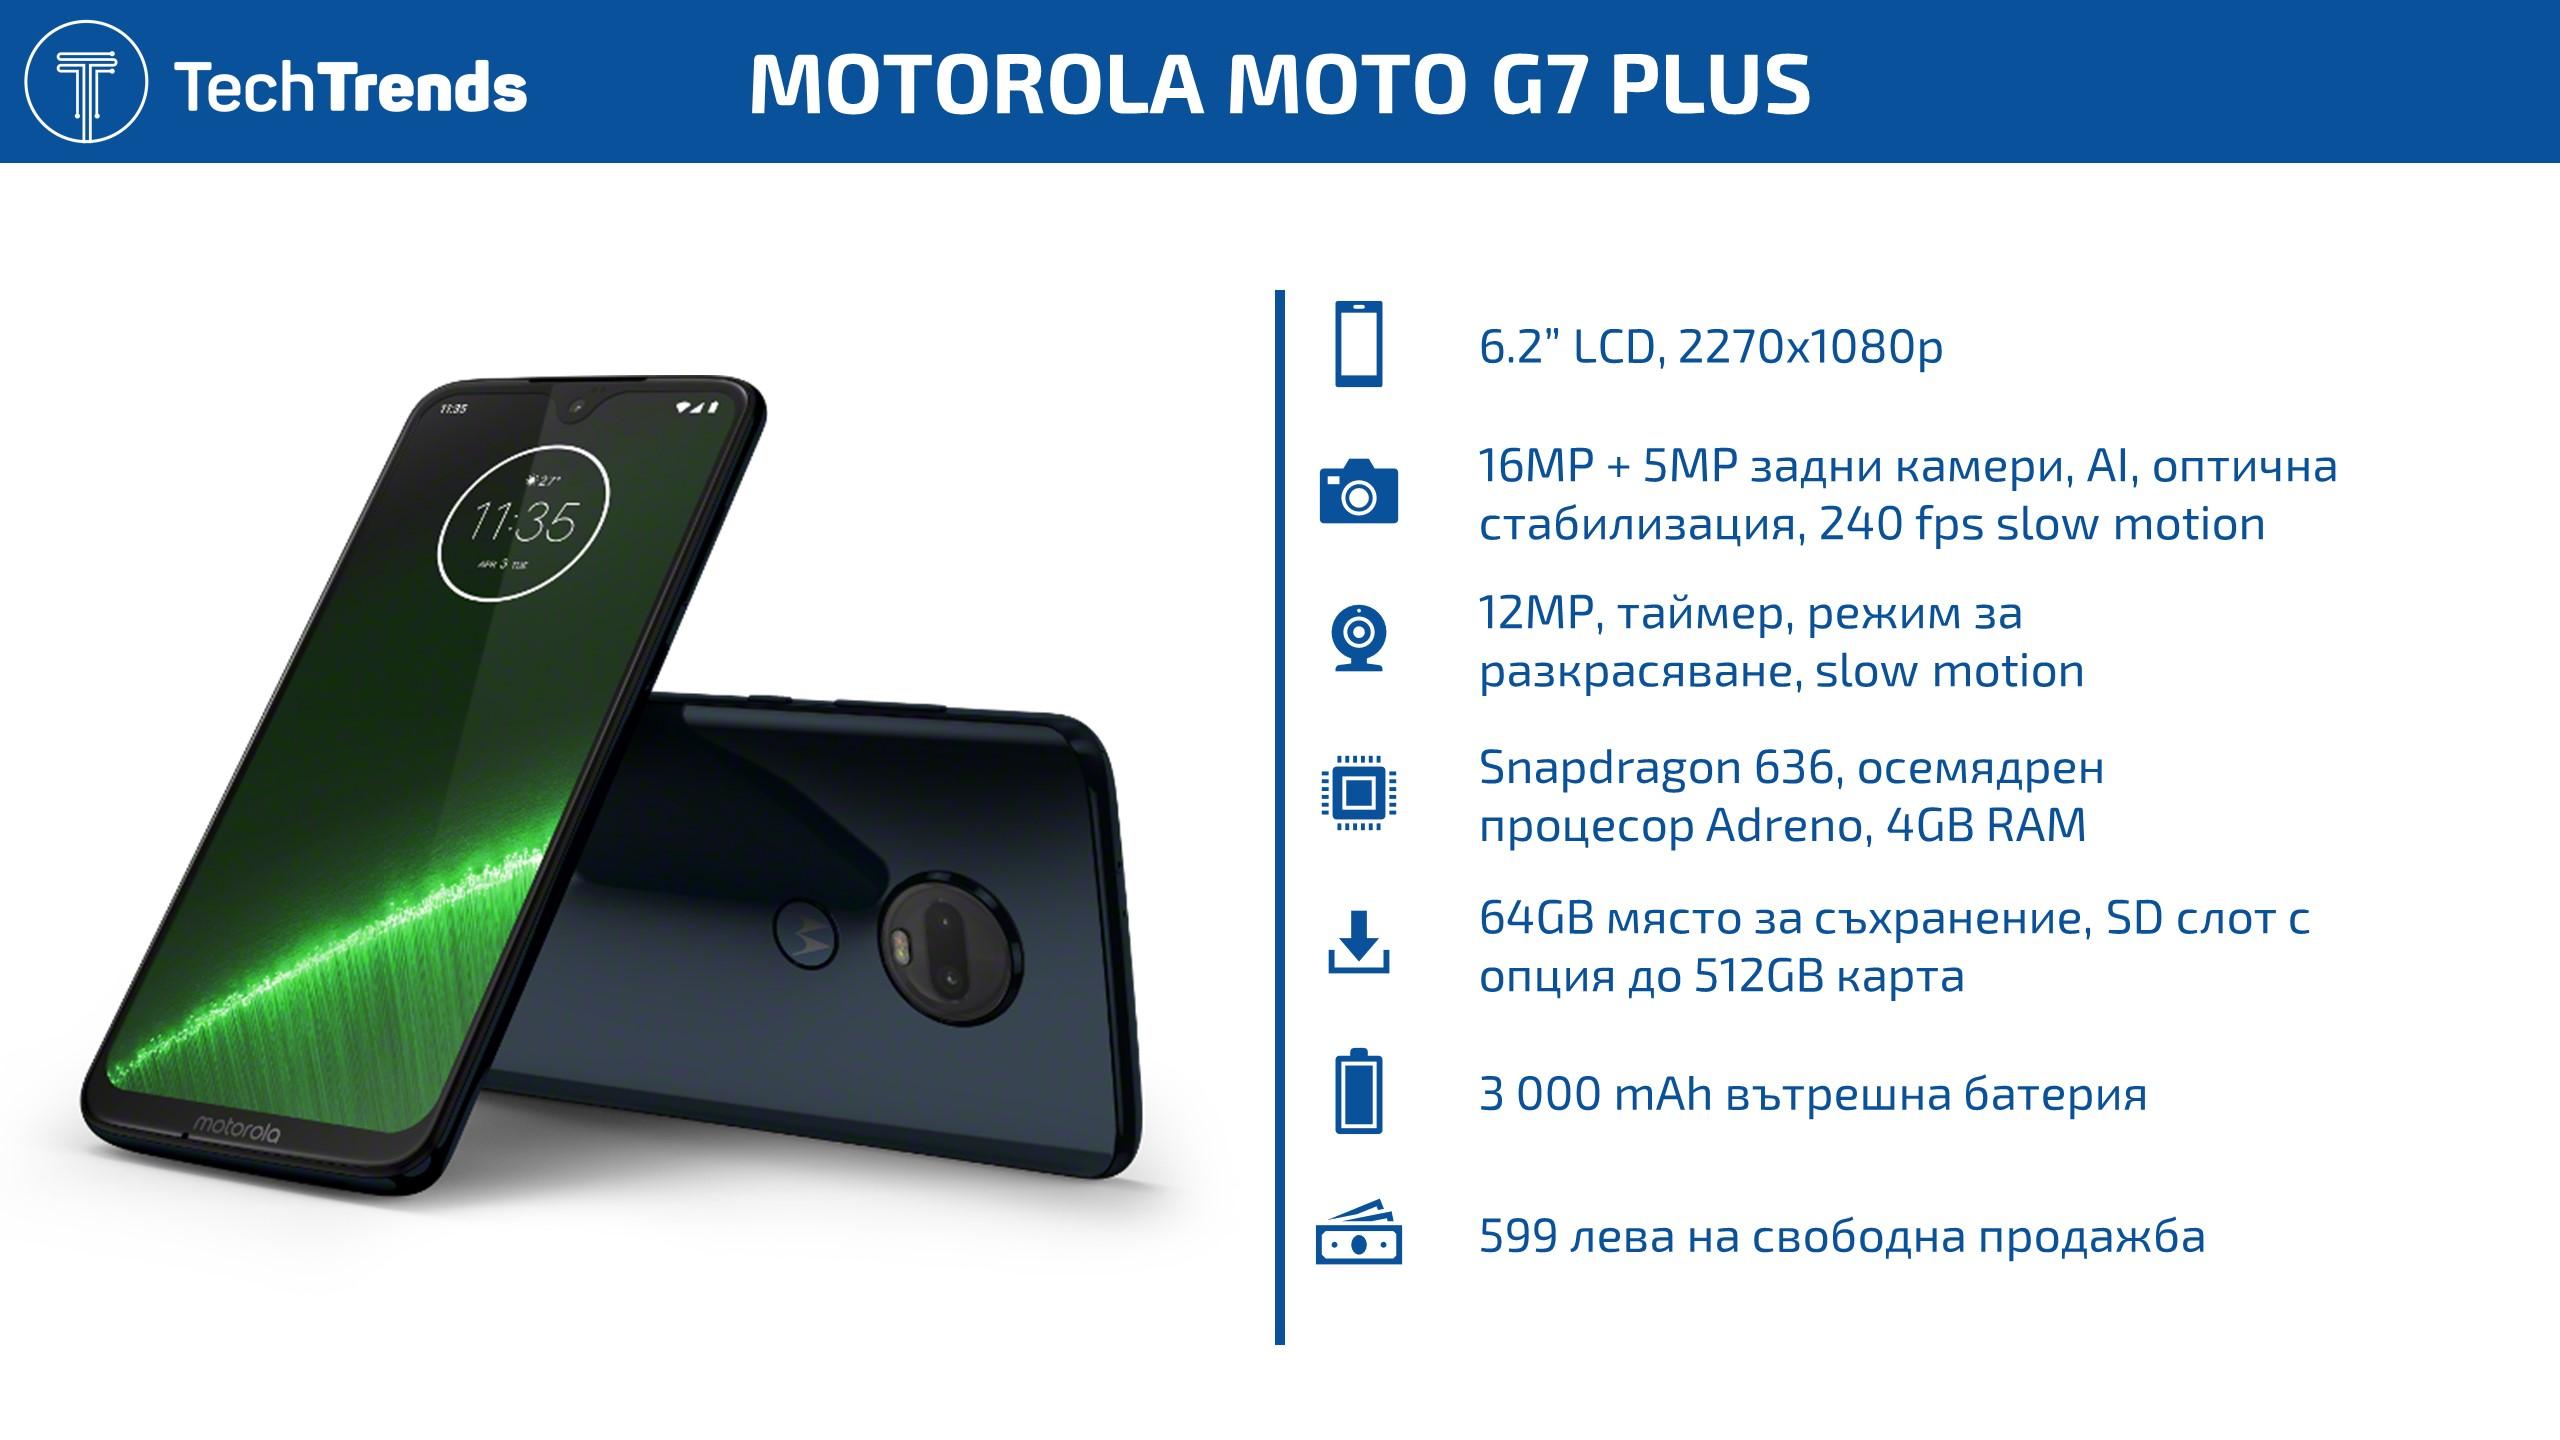 Moto G7 Plus Infographic